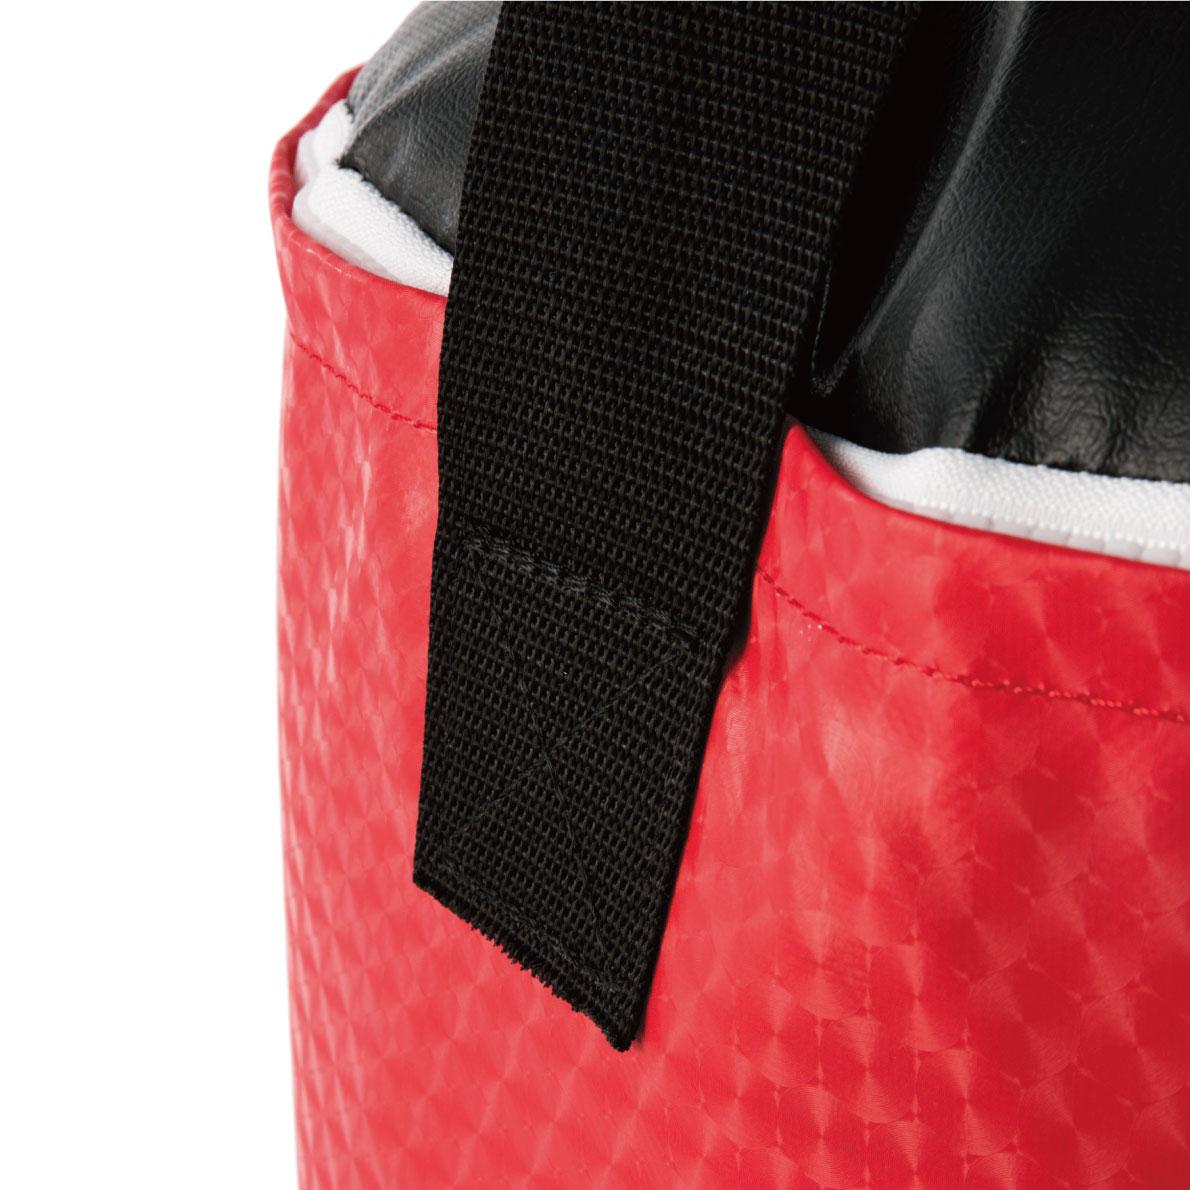 MMAヘビーバッグ 36KG/80L(UHK-69747)《総合格闘技UFCオフィシャル》